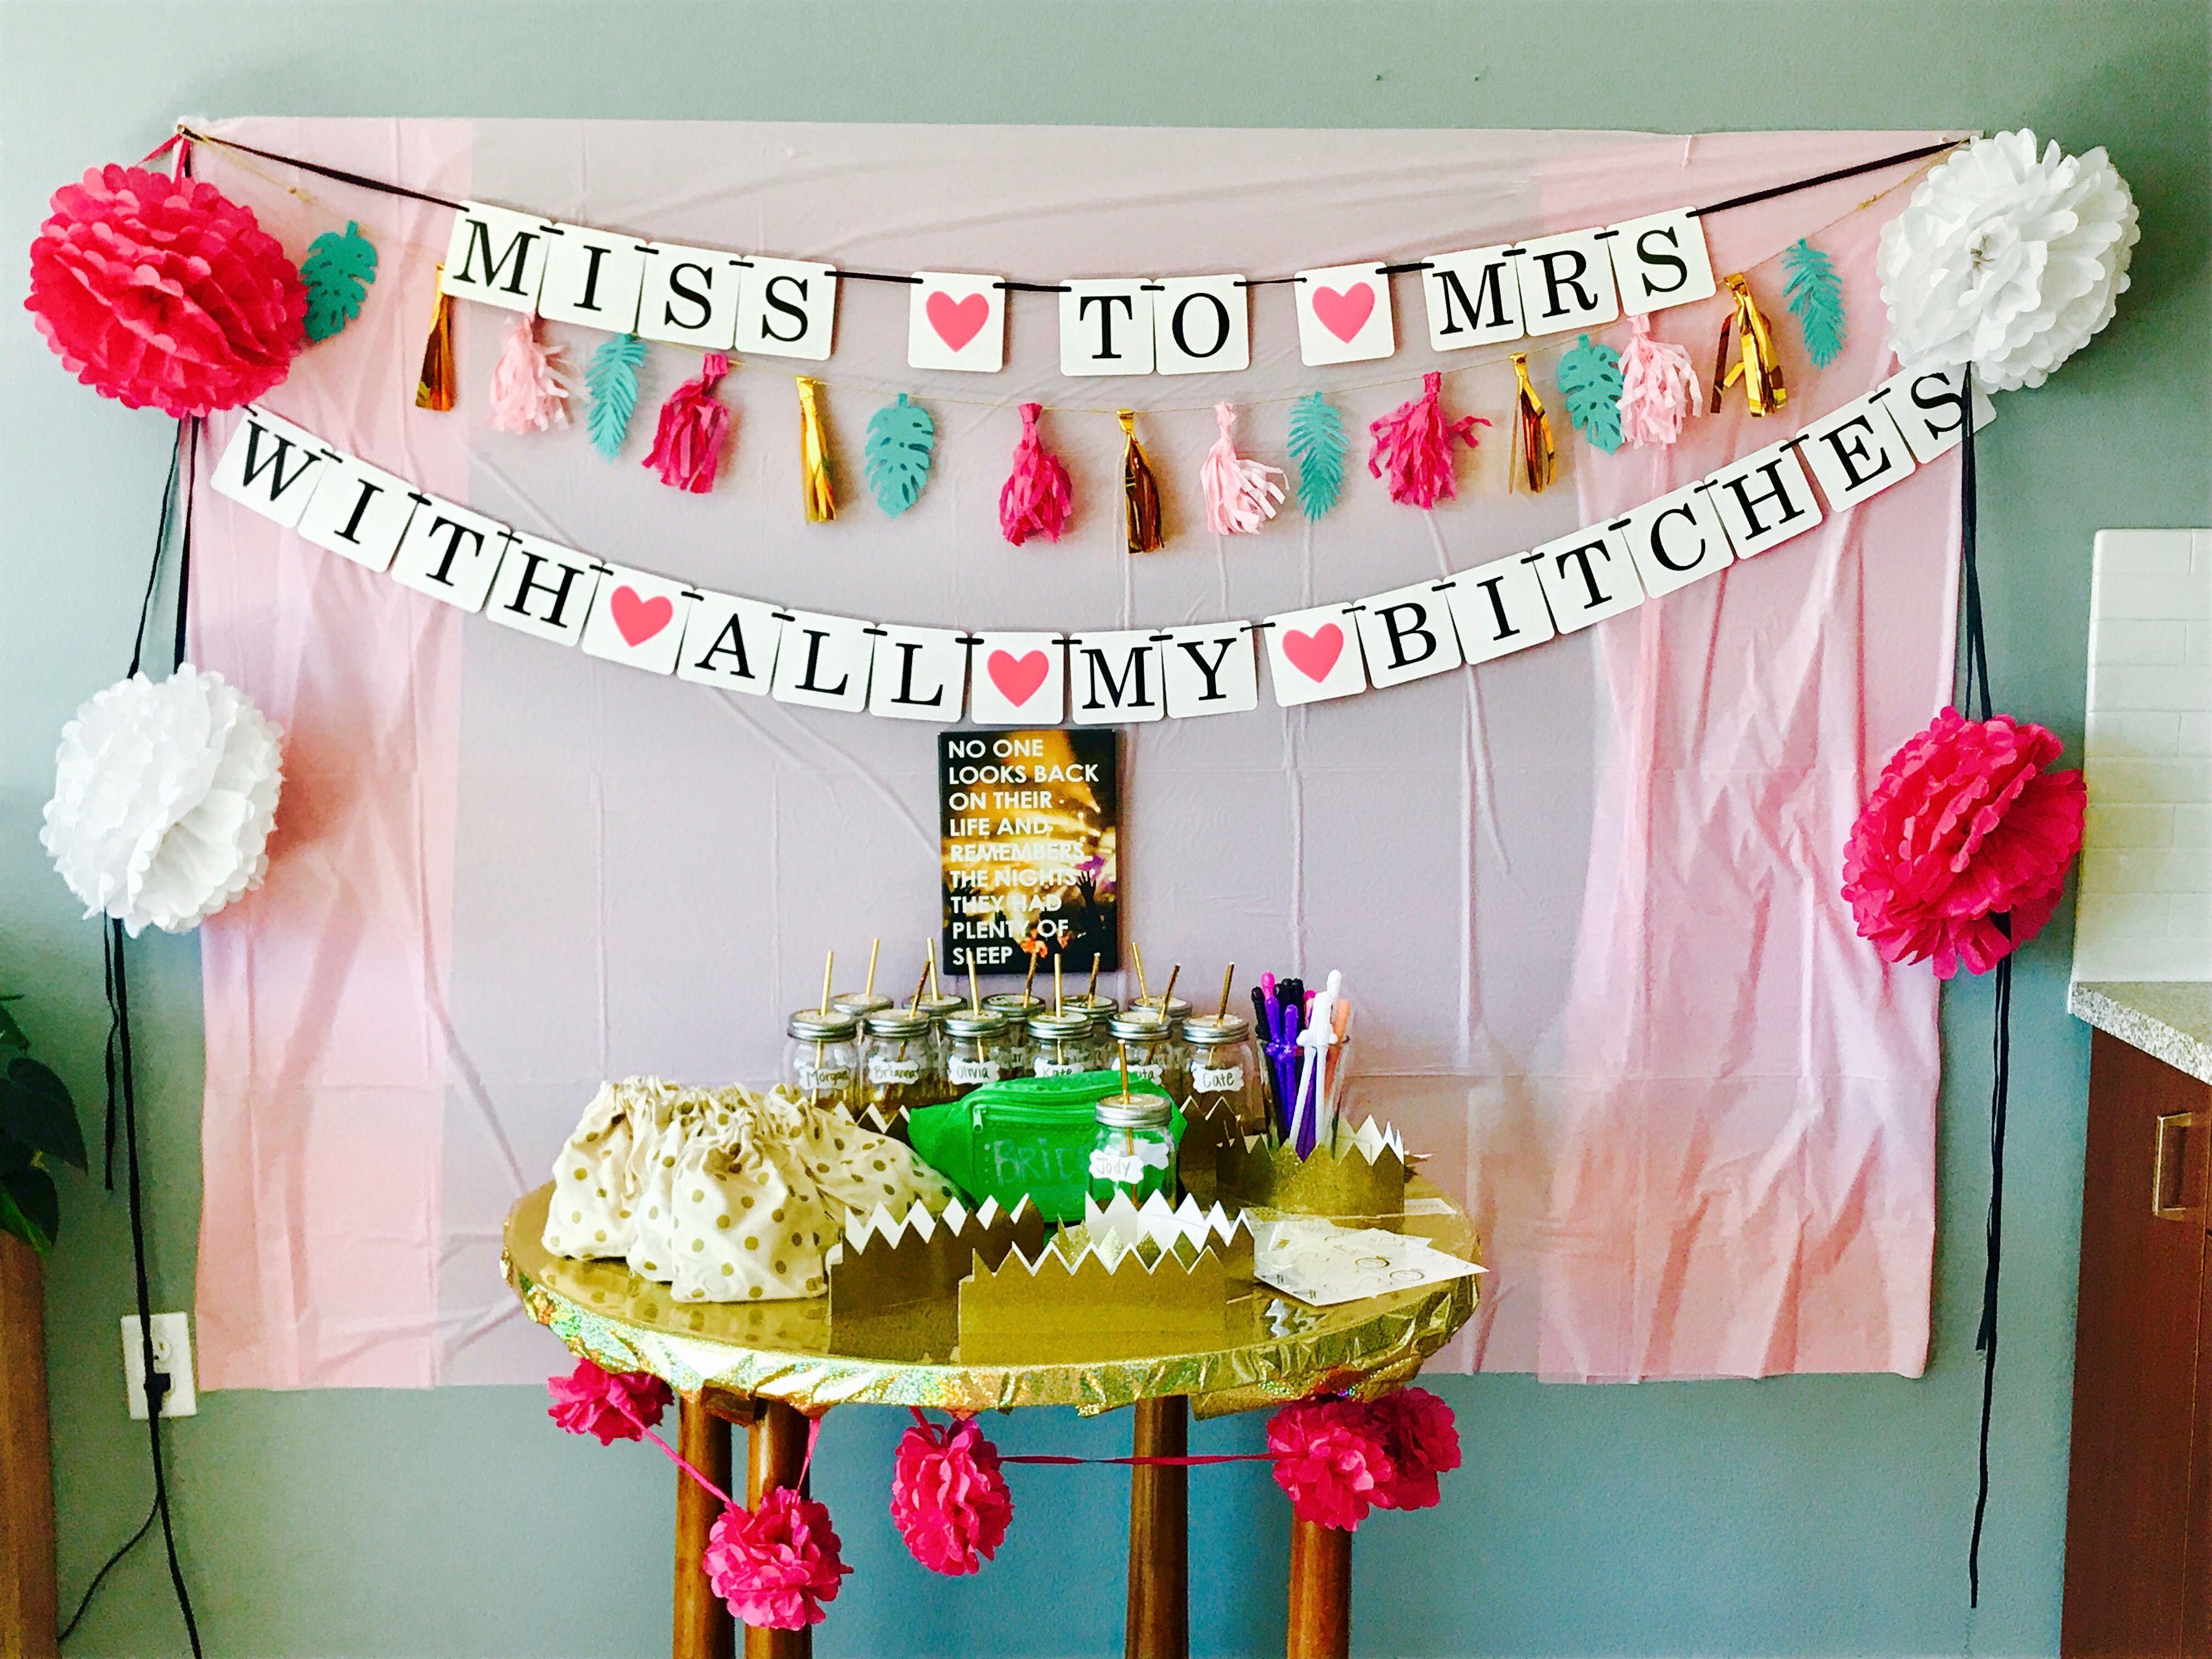 Diy Bachelorette Party Ideas Bachelorette Diy Diy Bachelorette Party Bachelorette Decorations Diy